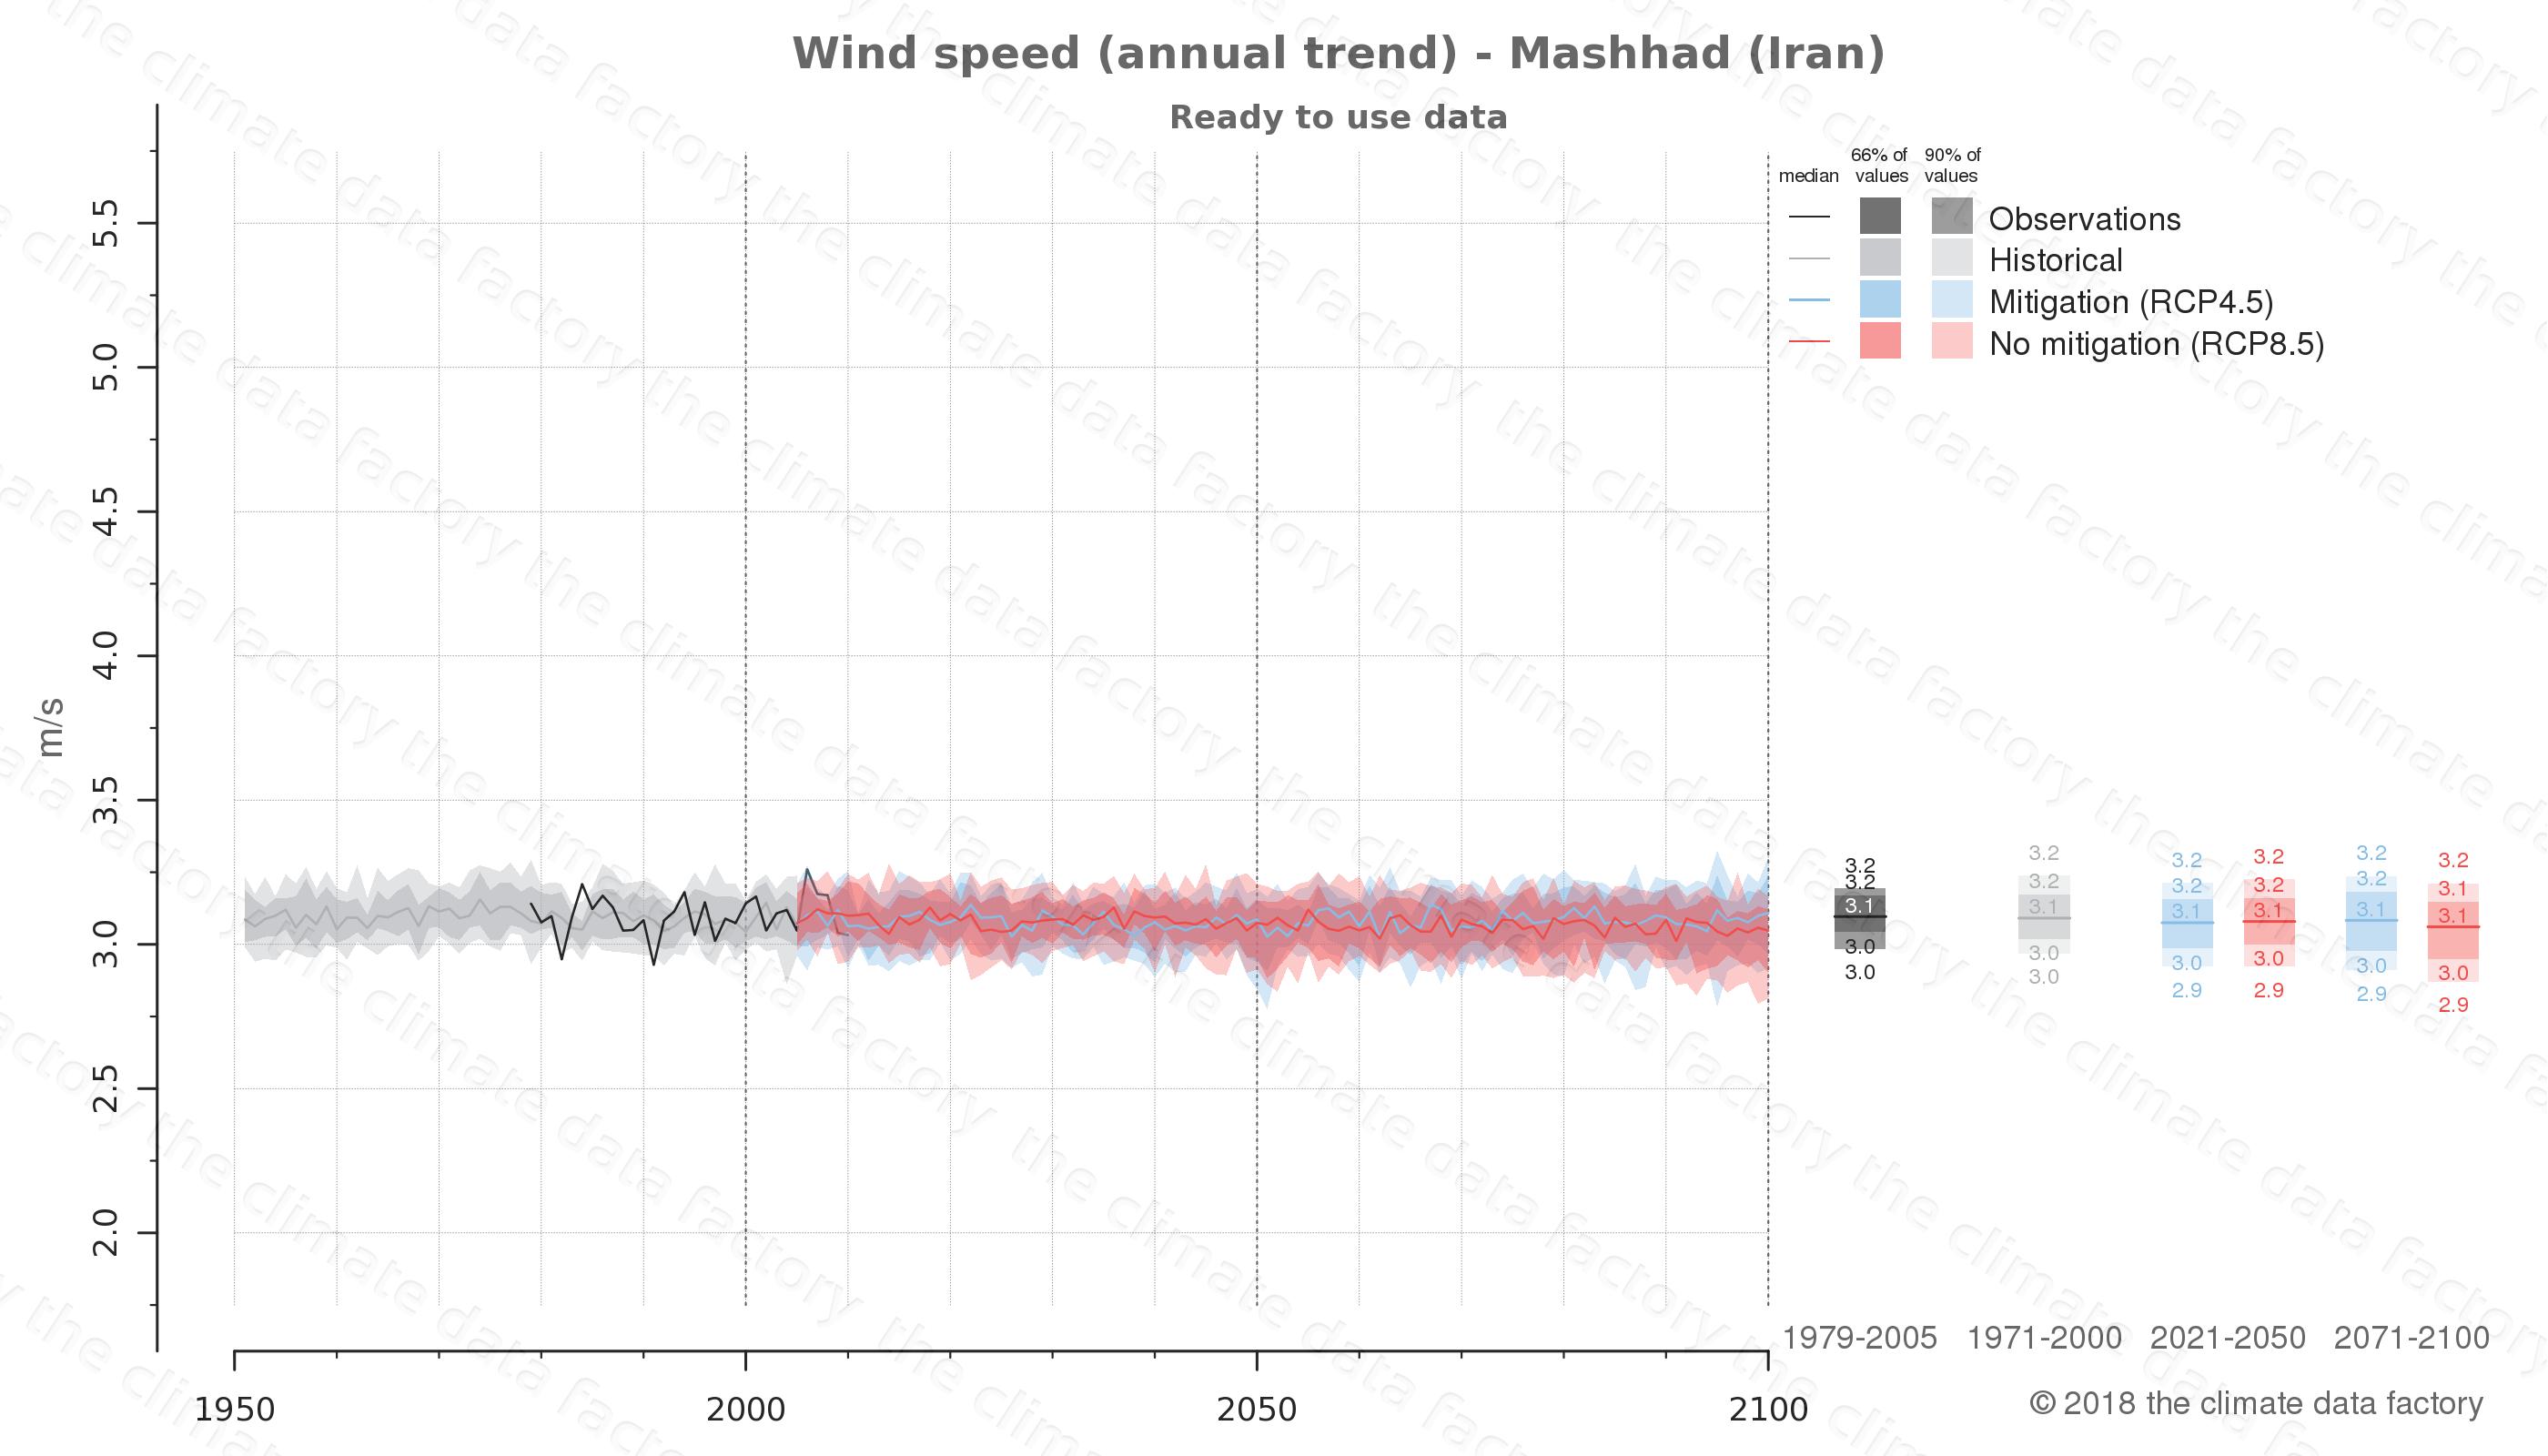 climate change data policy adaptation climate graph city data wind-speed mashhad iran